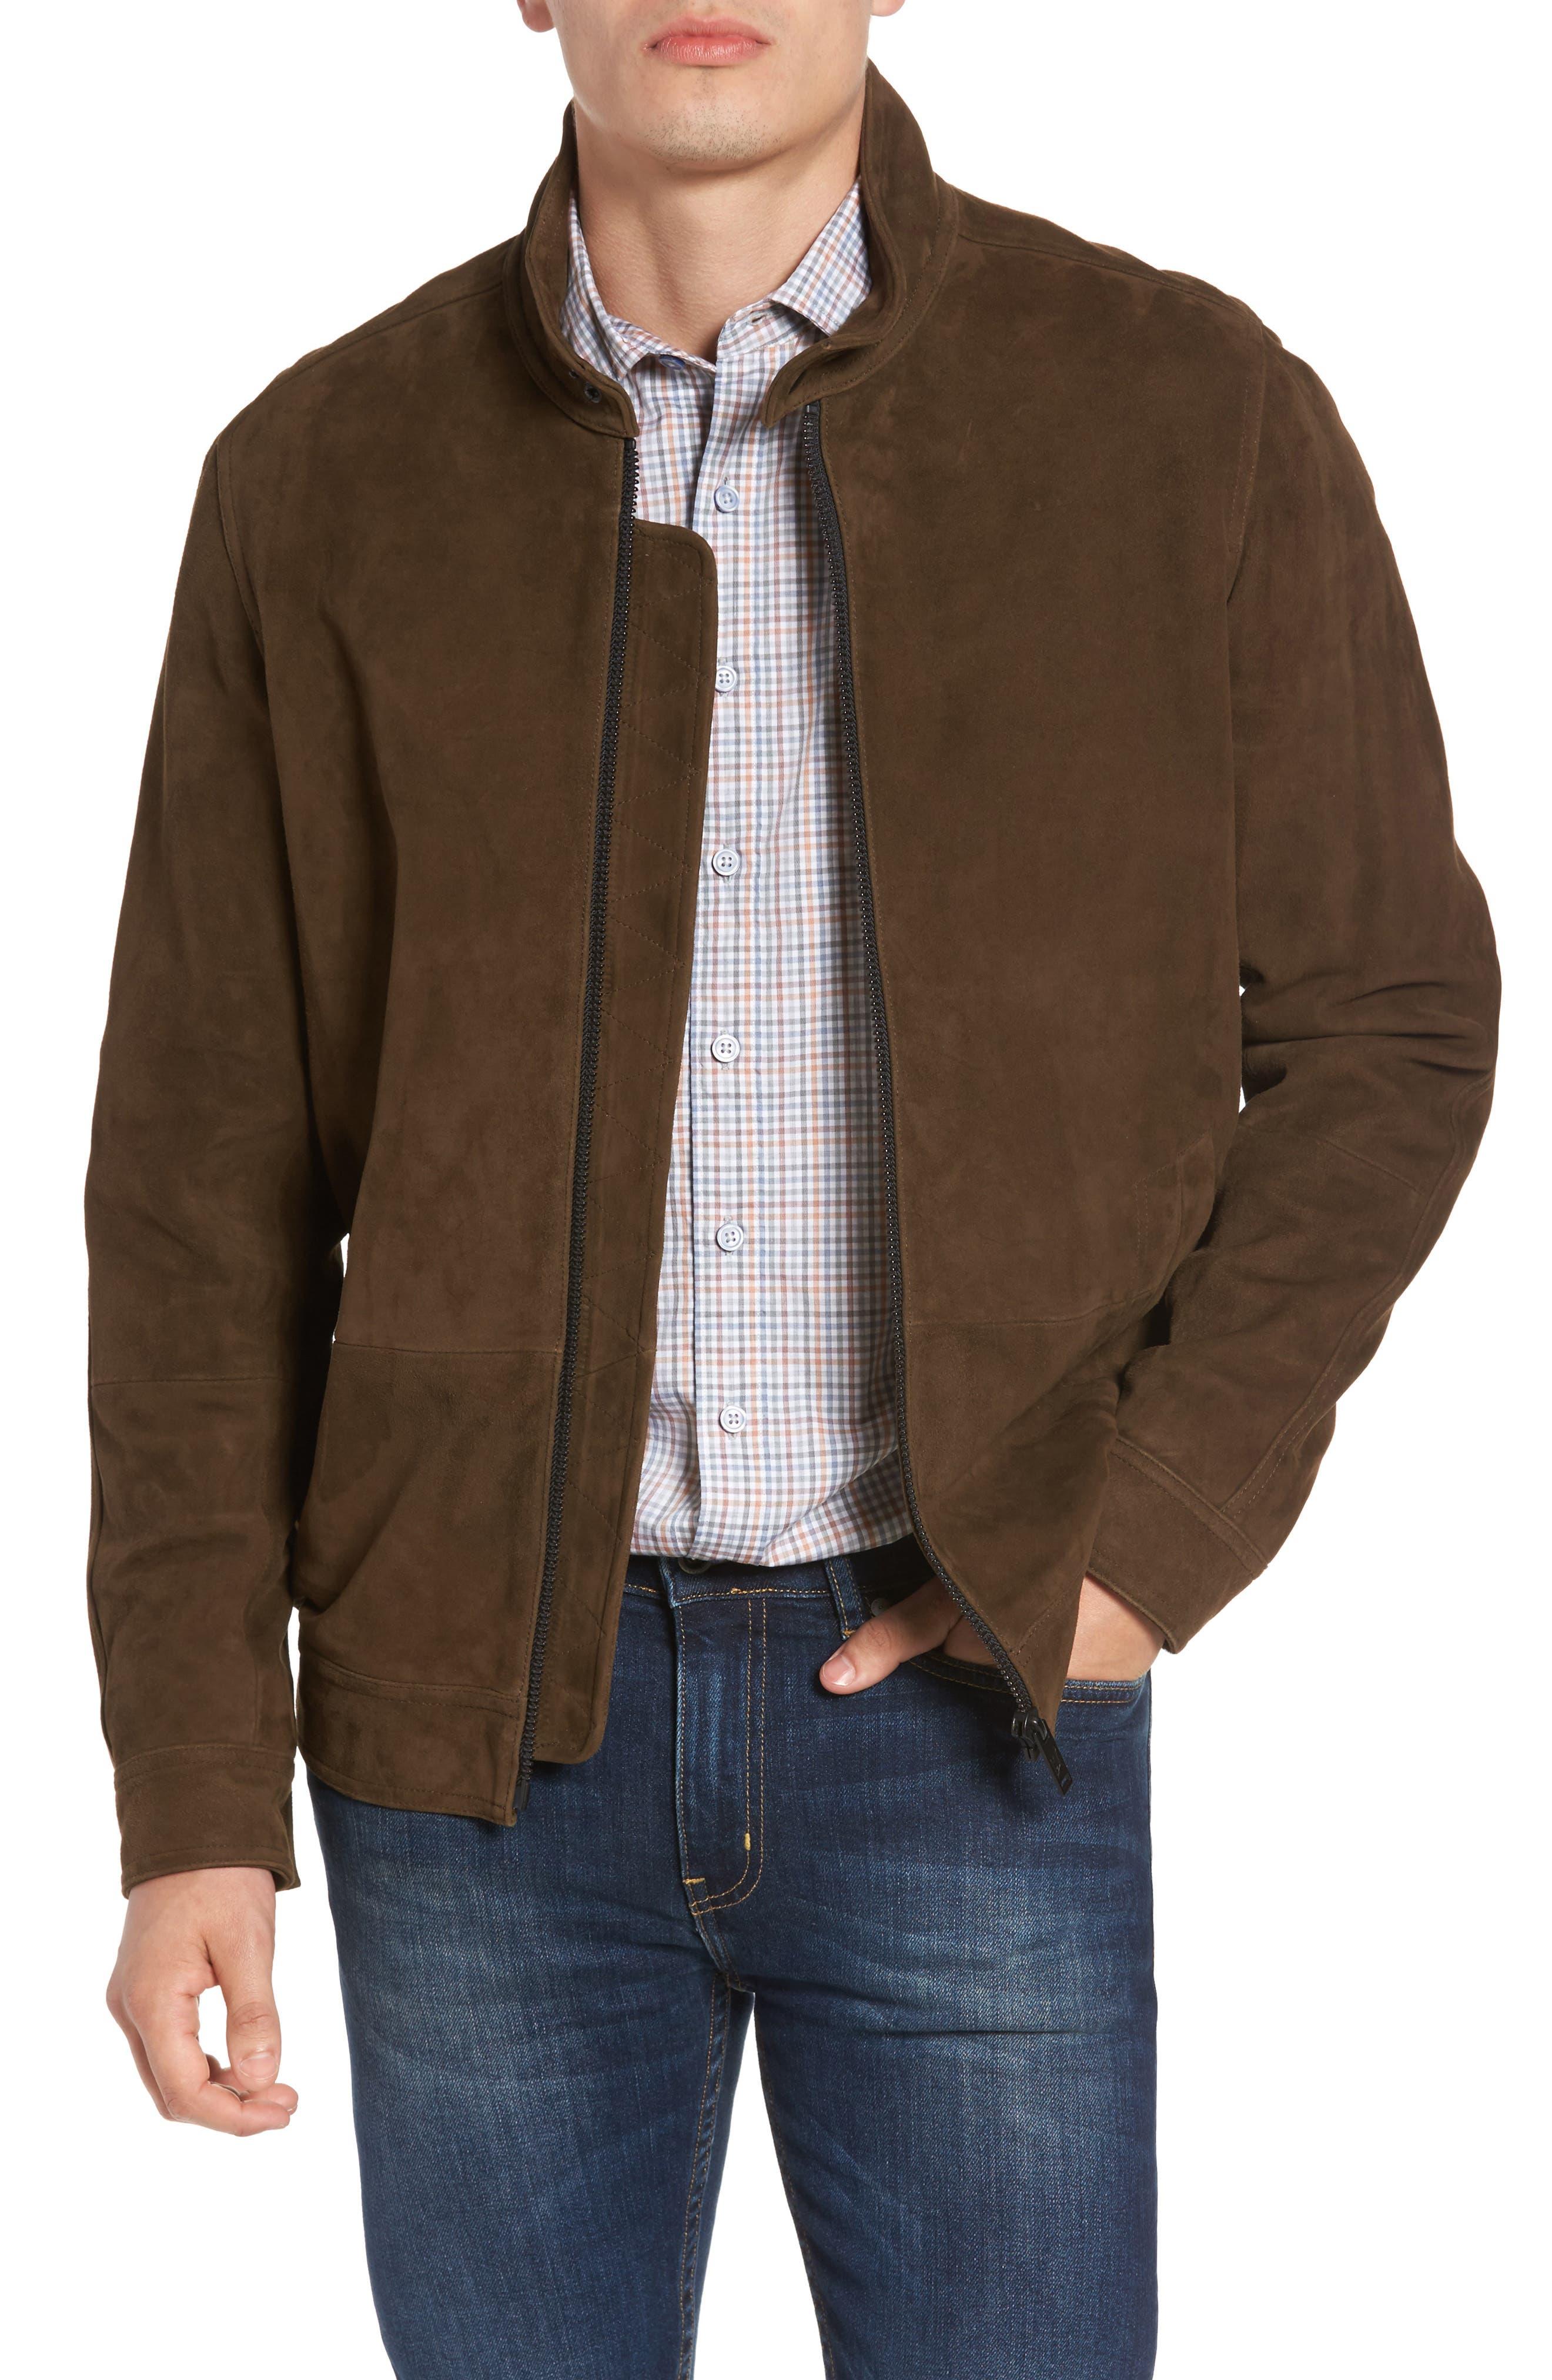 Main Image - Rodd & Gunn Avondale Suede Jacket